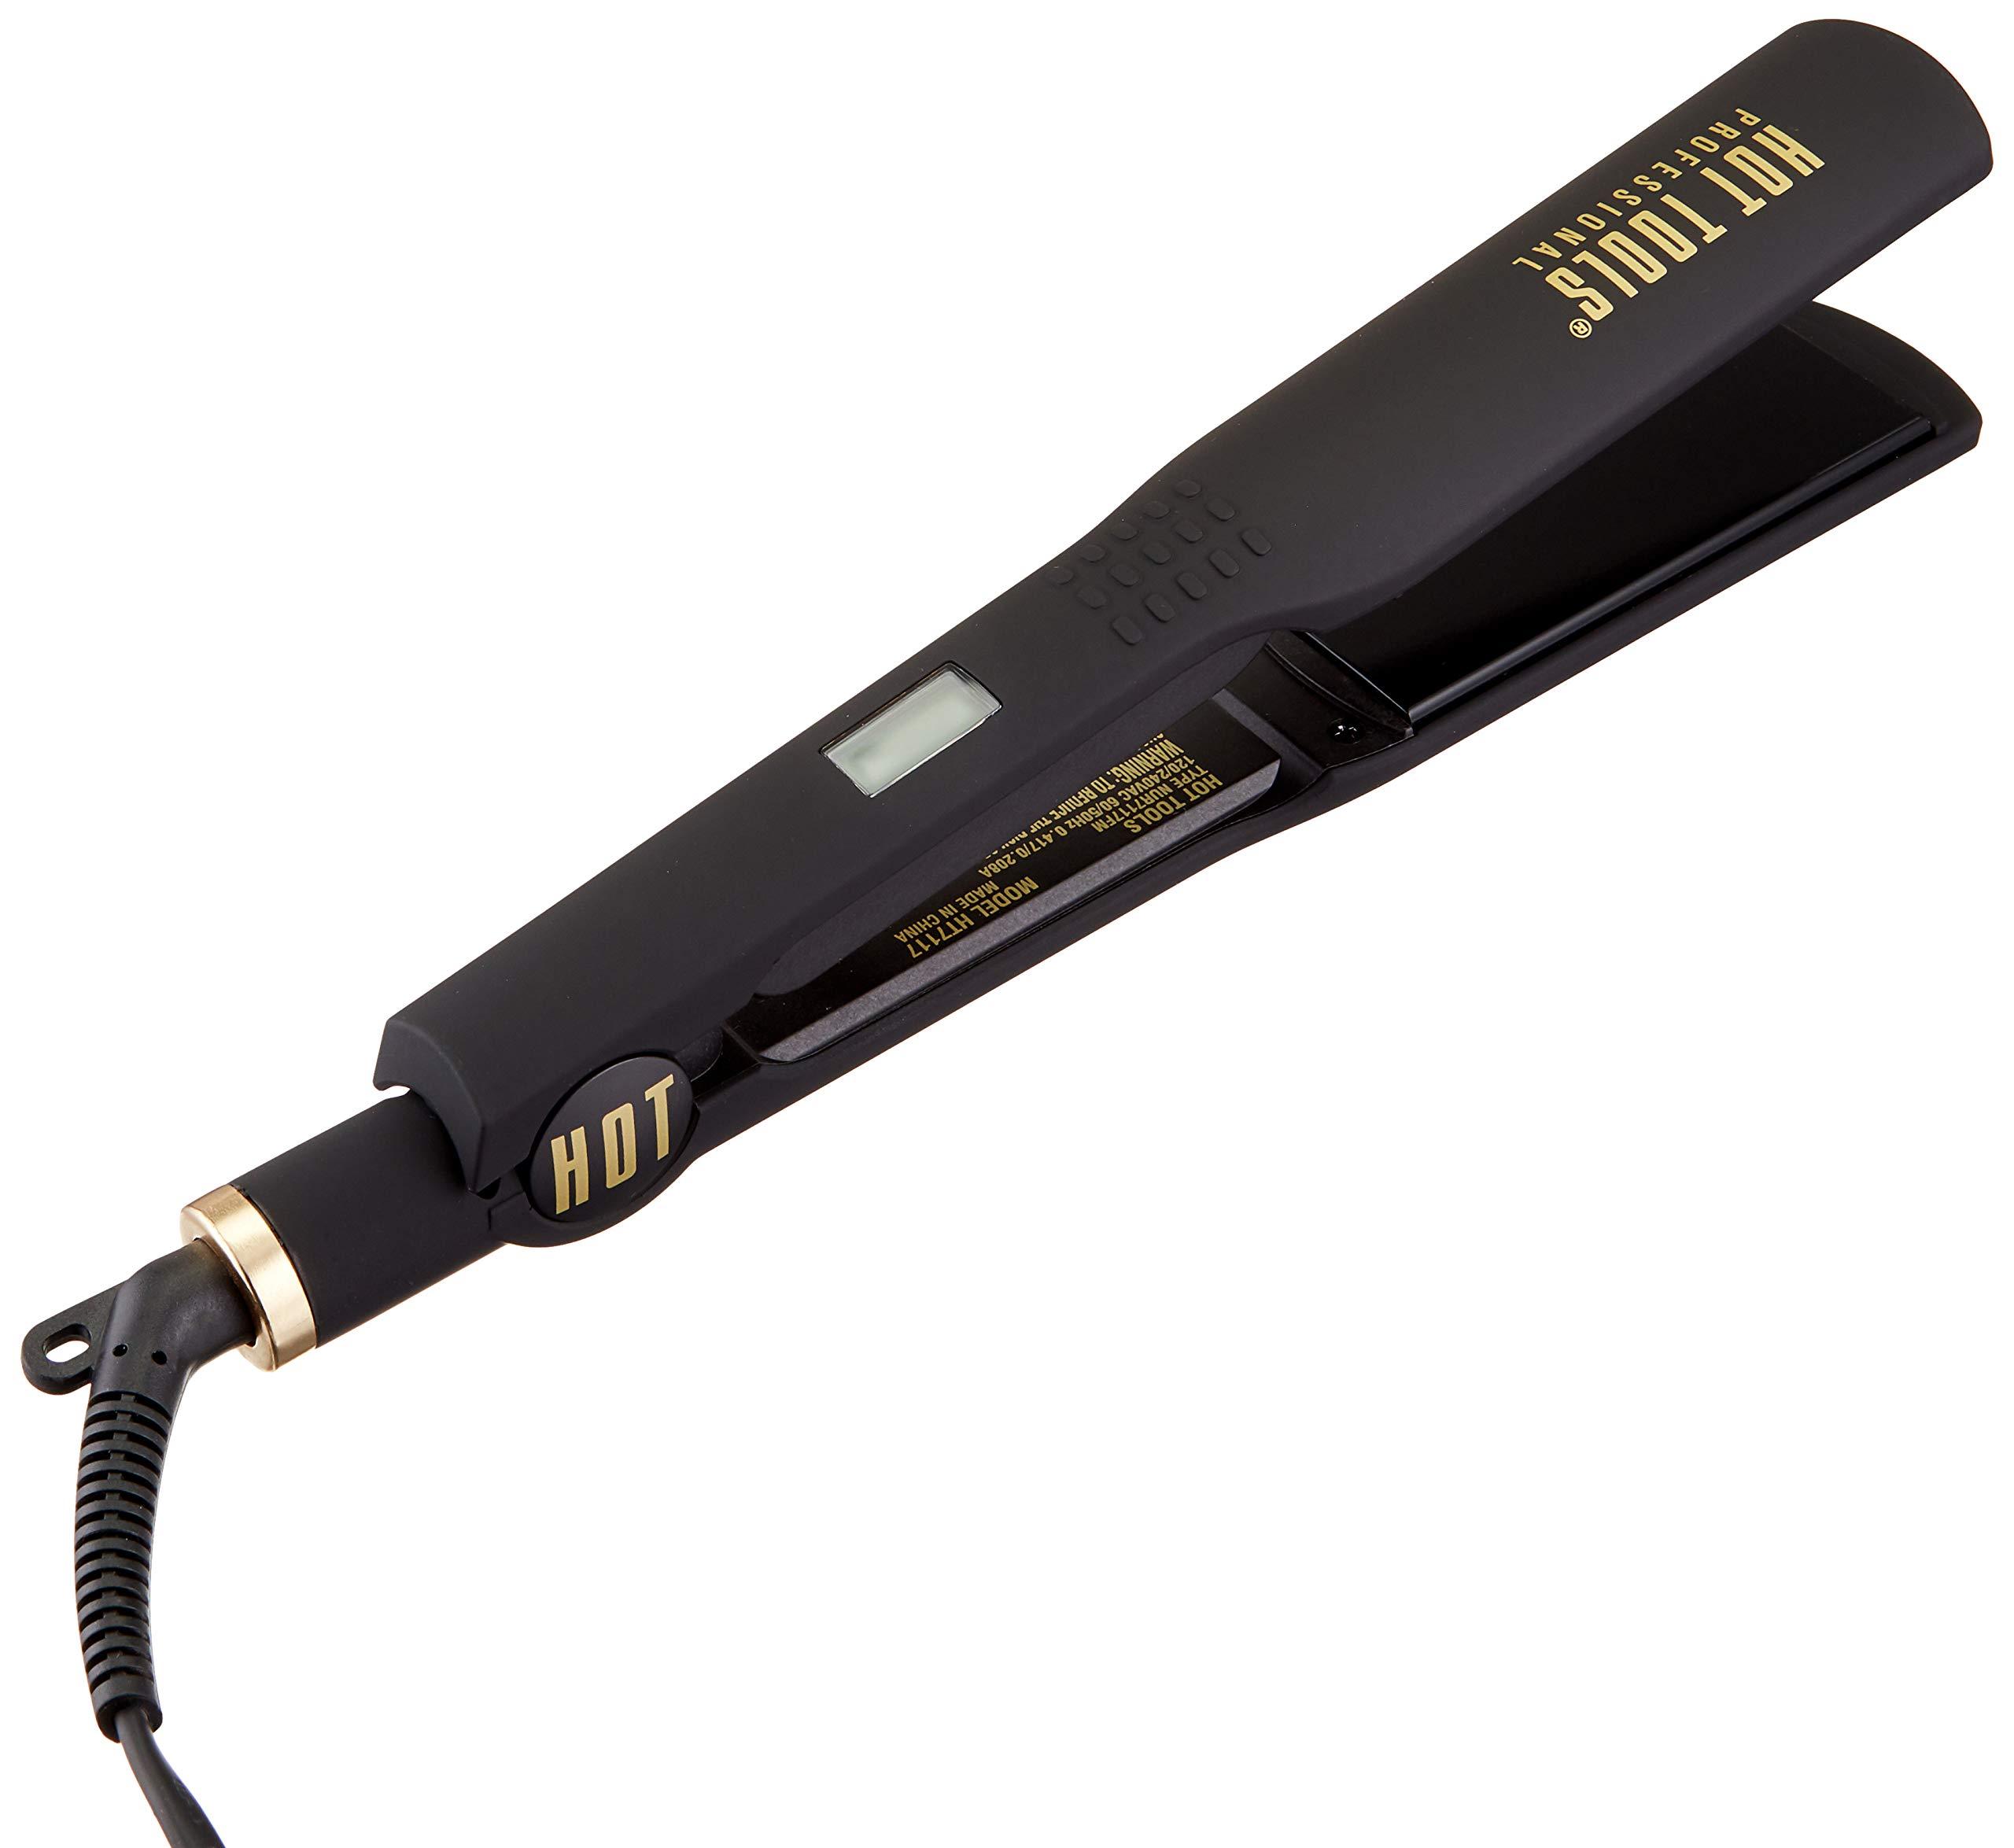 HOT TOOLS  Professional Black Gold Digital Flat Iron, 1 ¼ Inches